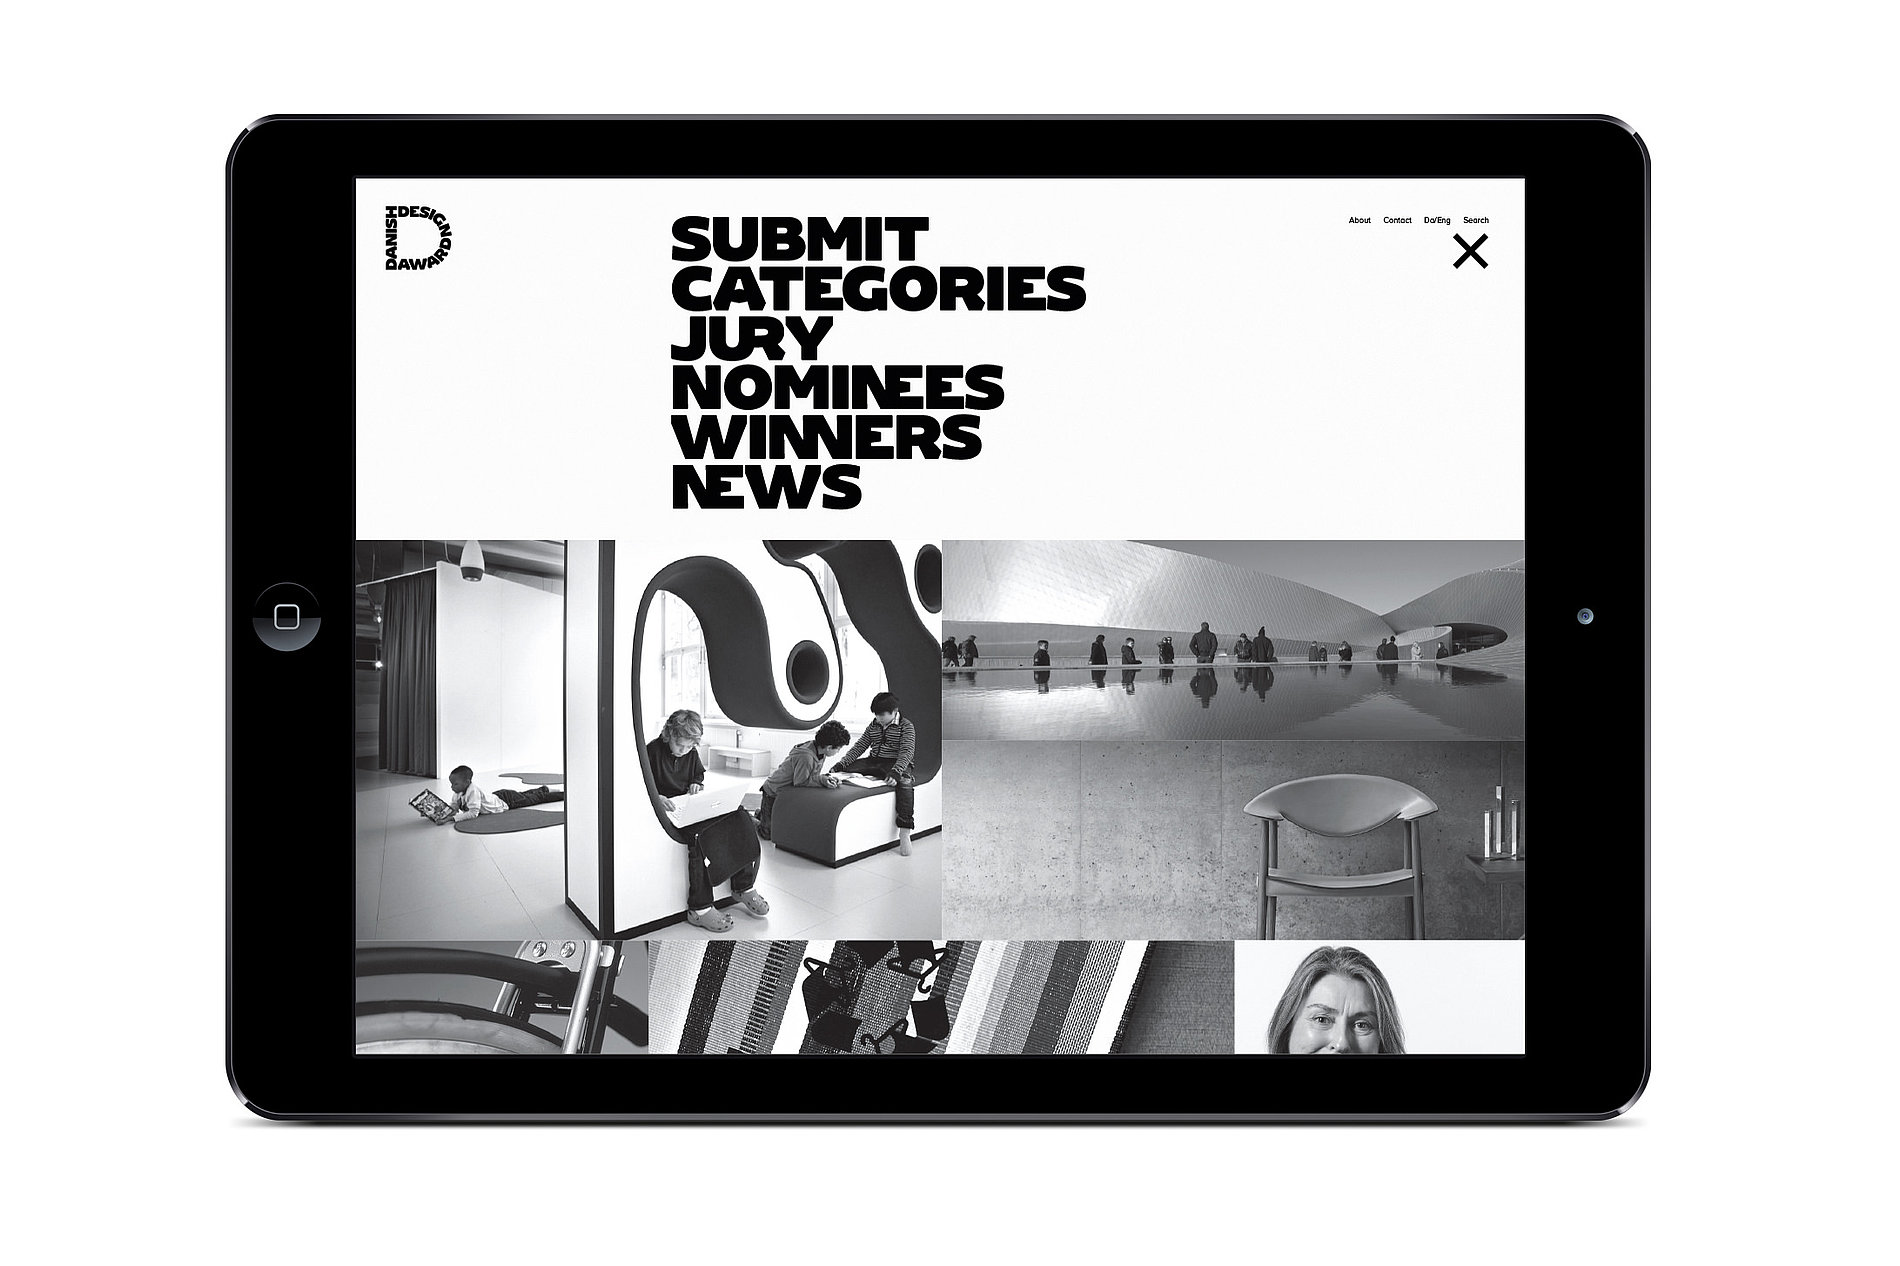 Danish Design Award: Celebrating Design | Red Dot Design Award